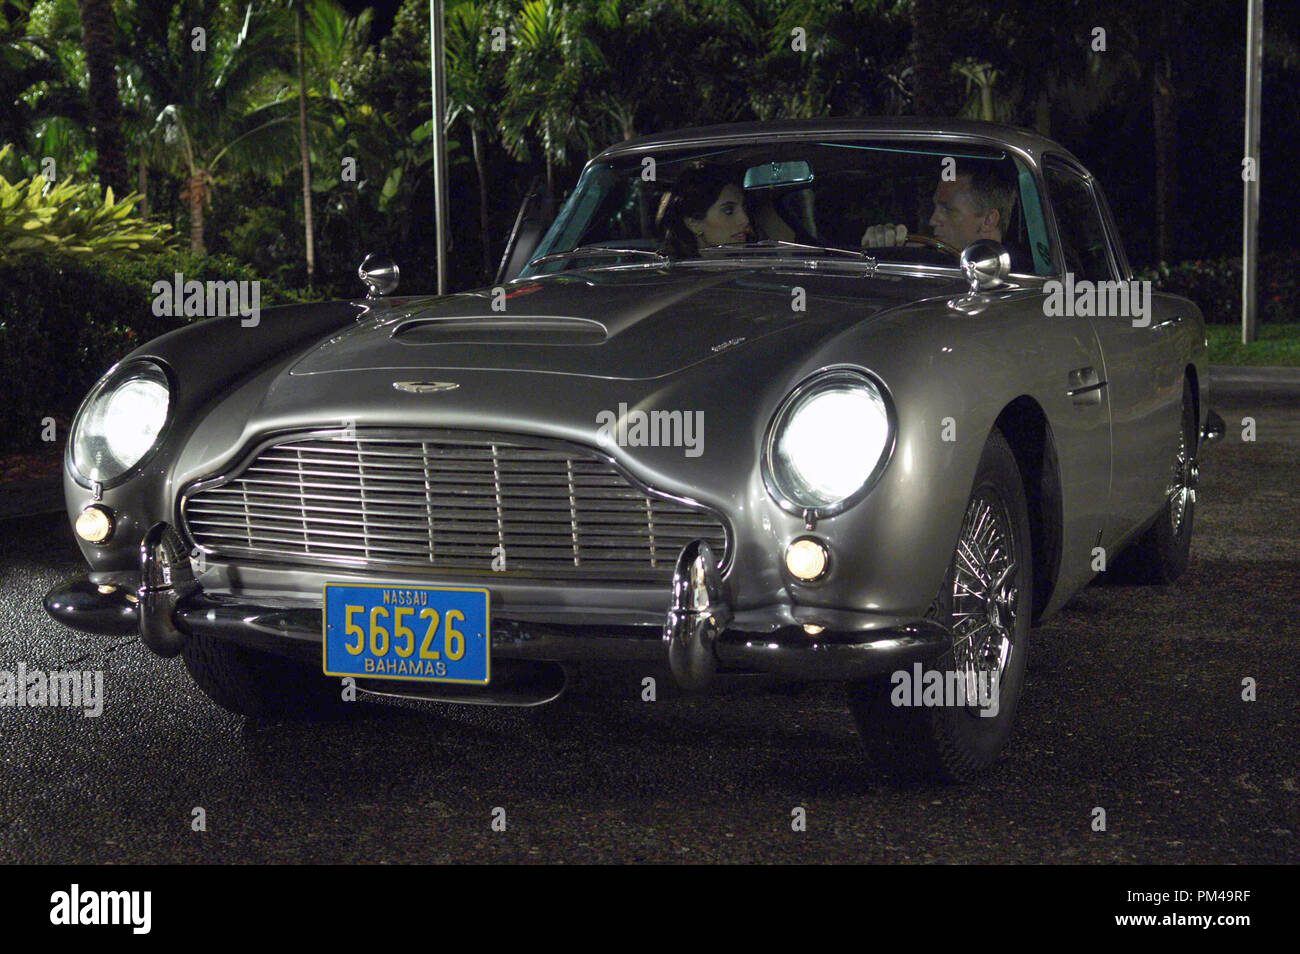 Daniel Craig Aston Martin High Resolution Stock Photography And Images Alamy